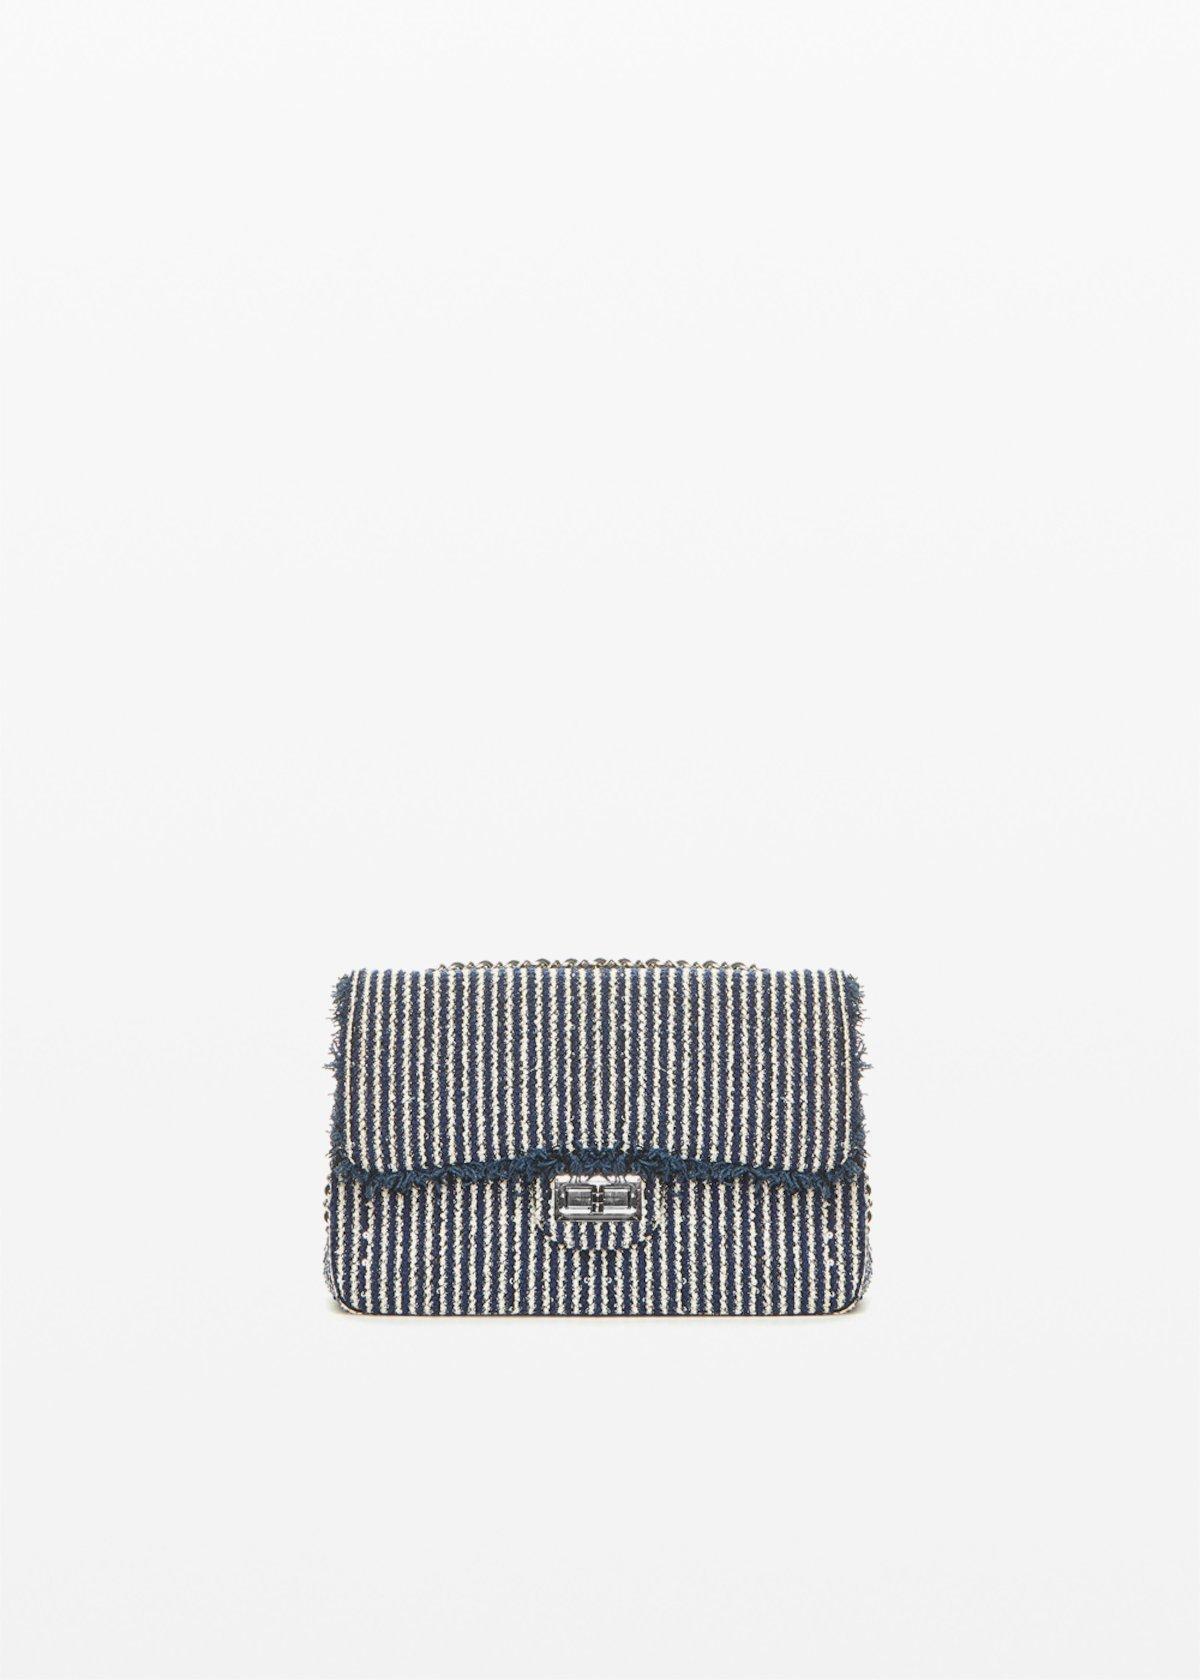 Pochette Giadastri semi rigida - Blue / White Stripes - Donna - Immagine categoria